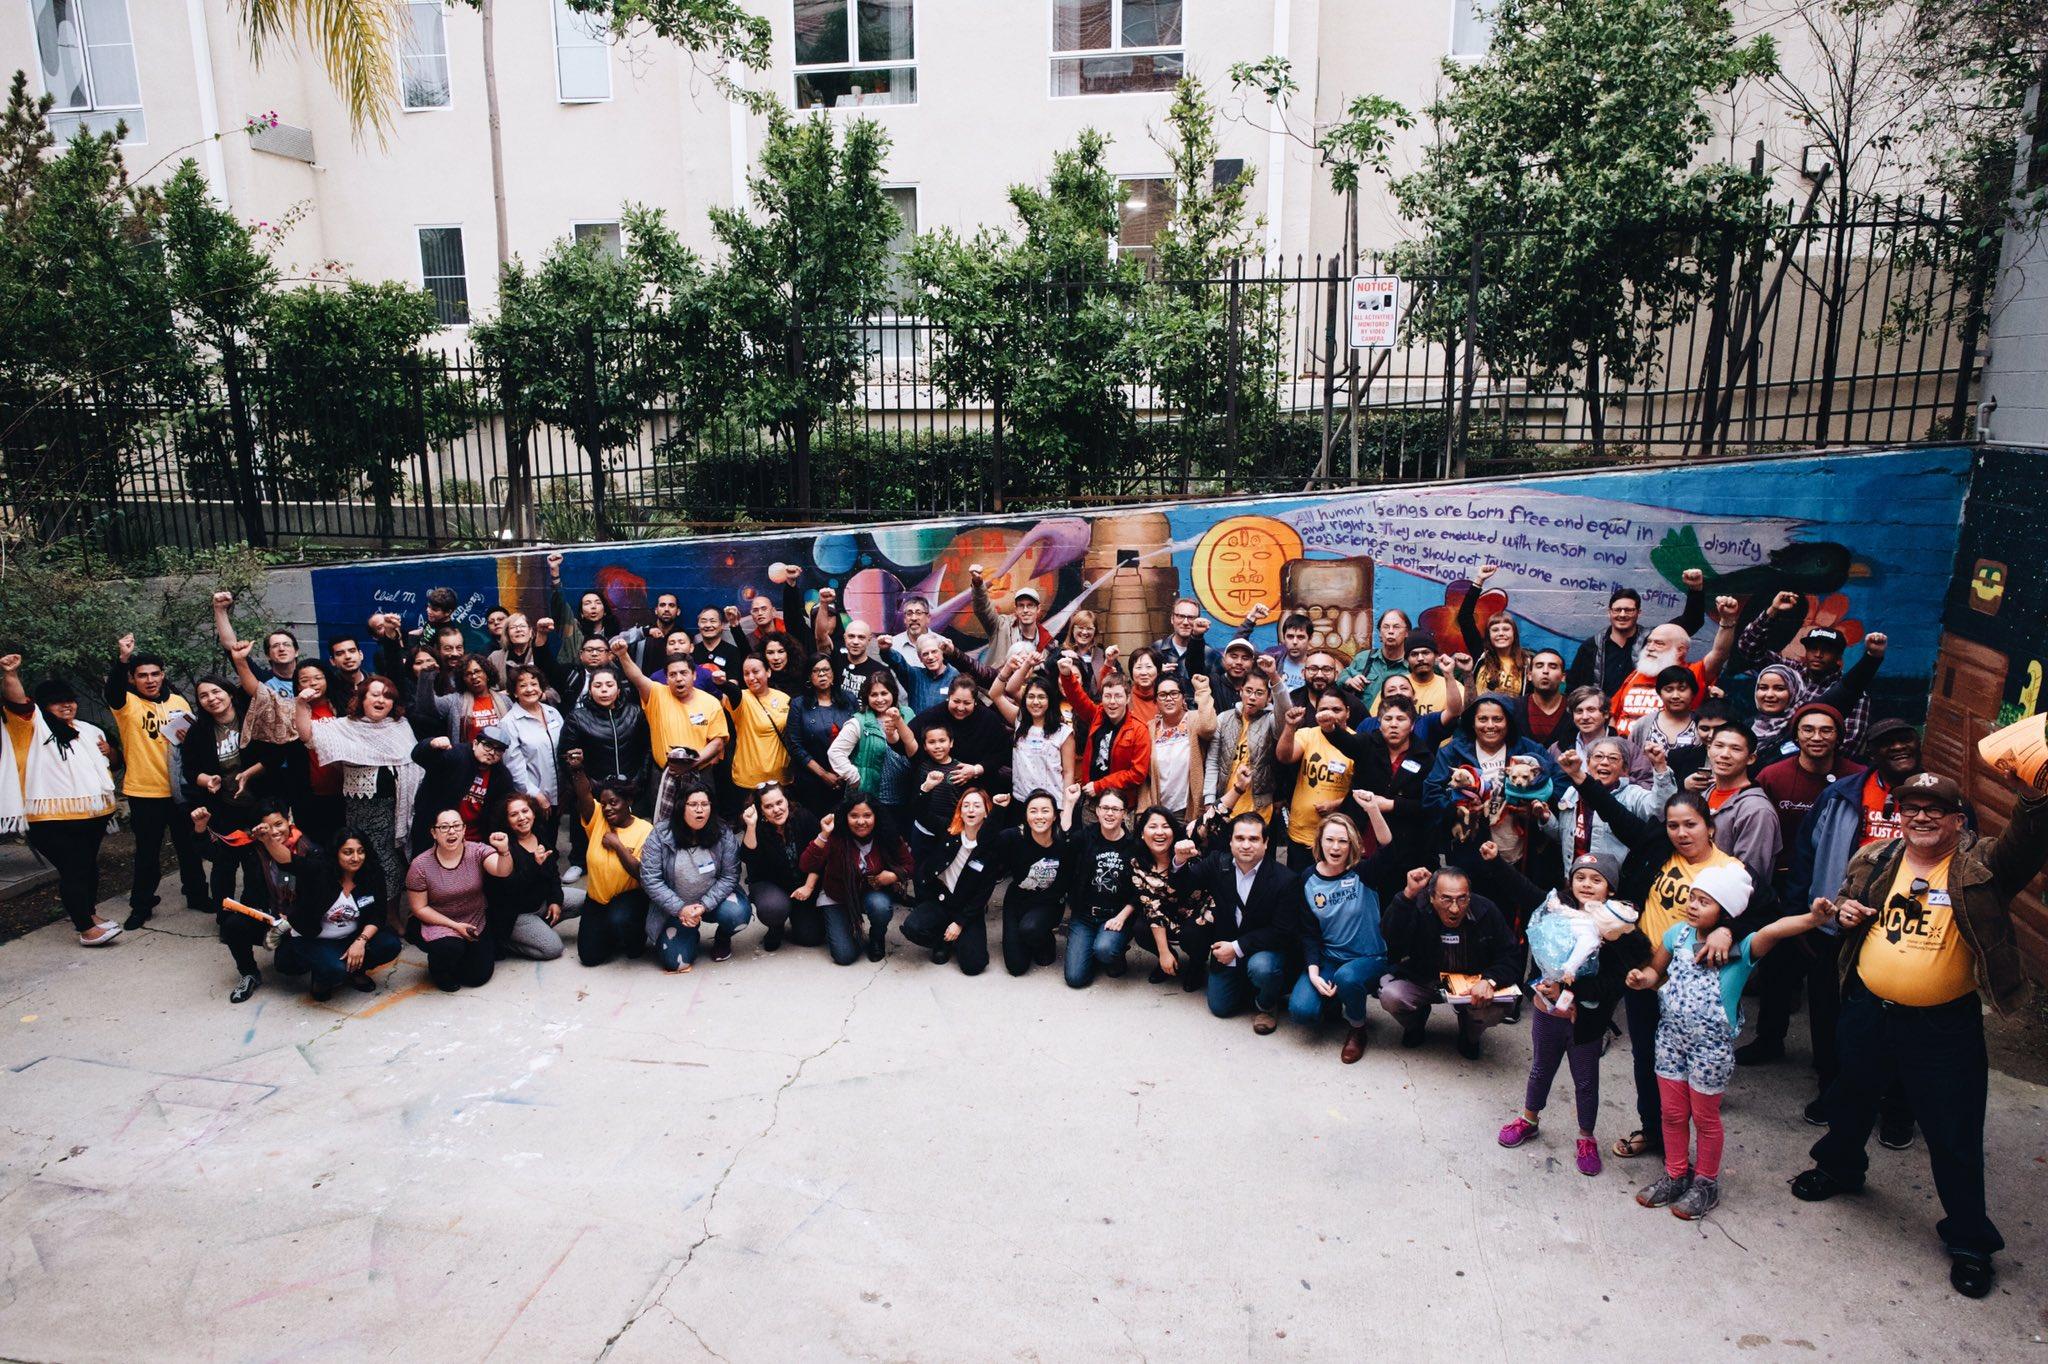 California Renters Unite! #RenterPowerCA #PoderInquilinxCA #HomesForAll @CalOrganize @TenantsTogether @CausaJusta1 @LATenantsUnion https://t.co/76TbehvcSn